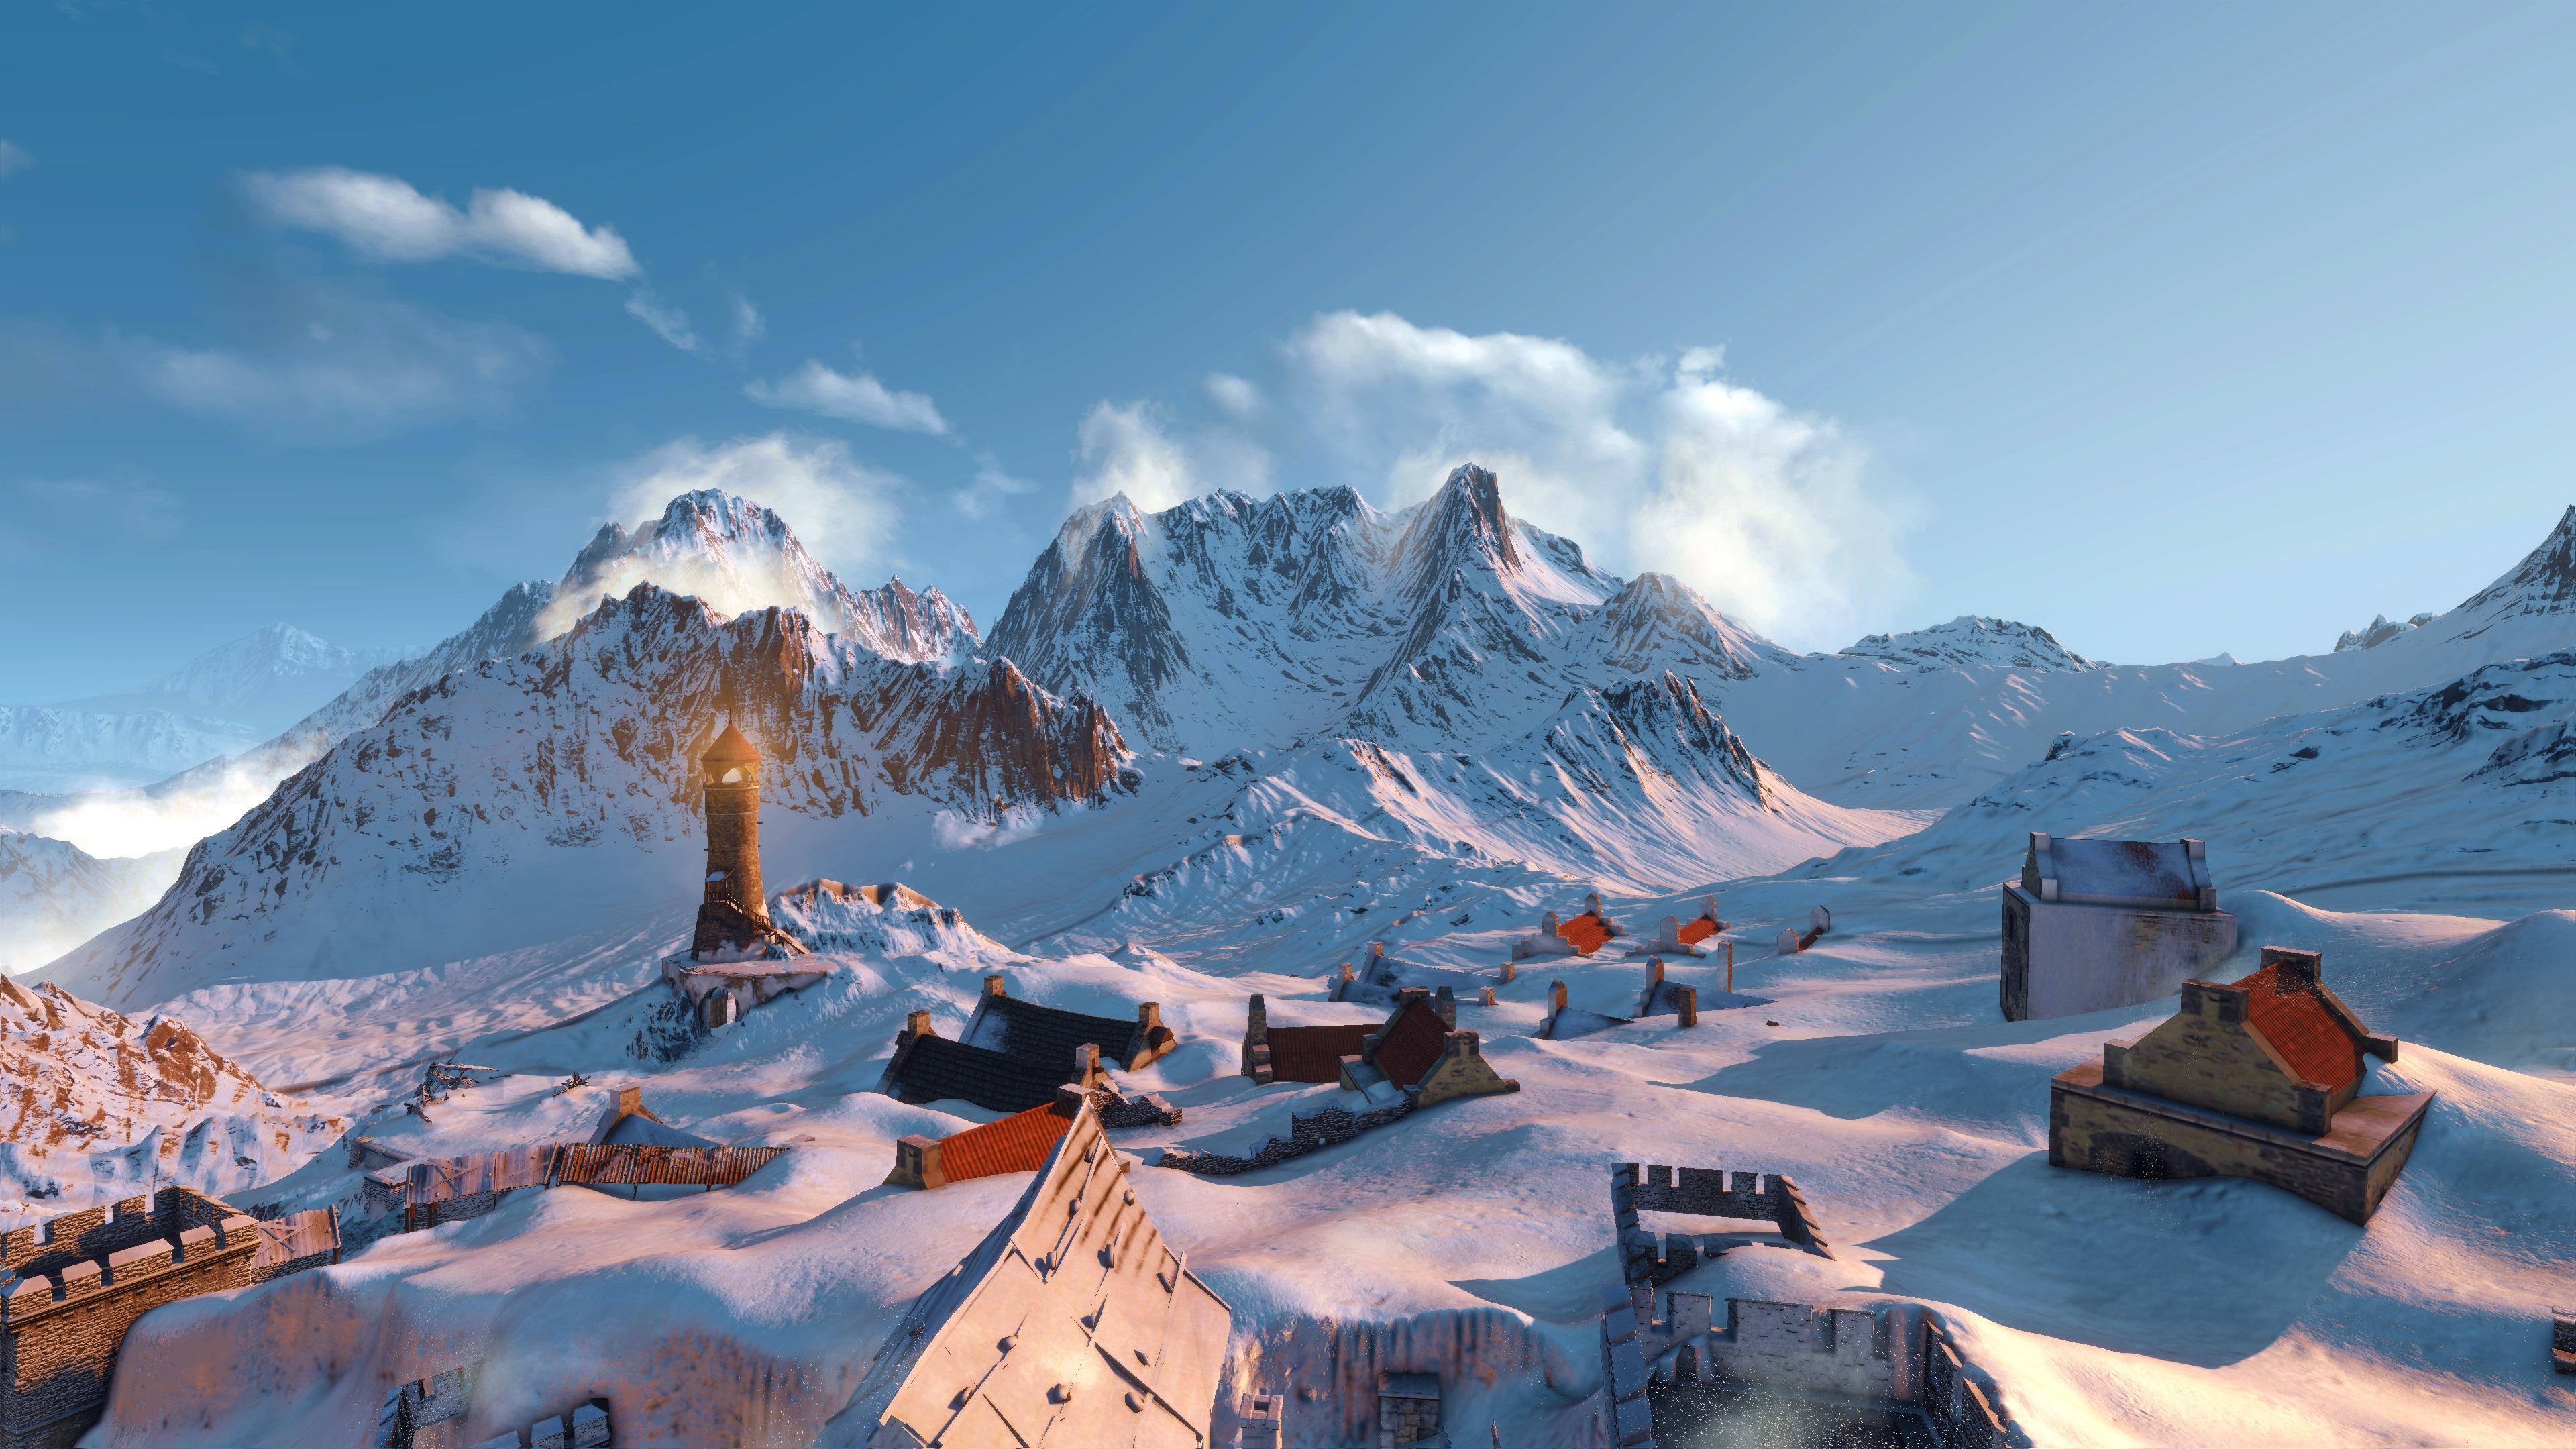 Fondos De Pantalla The Witcher 3 Wild Hunt Montañas Nieve